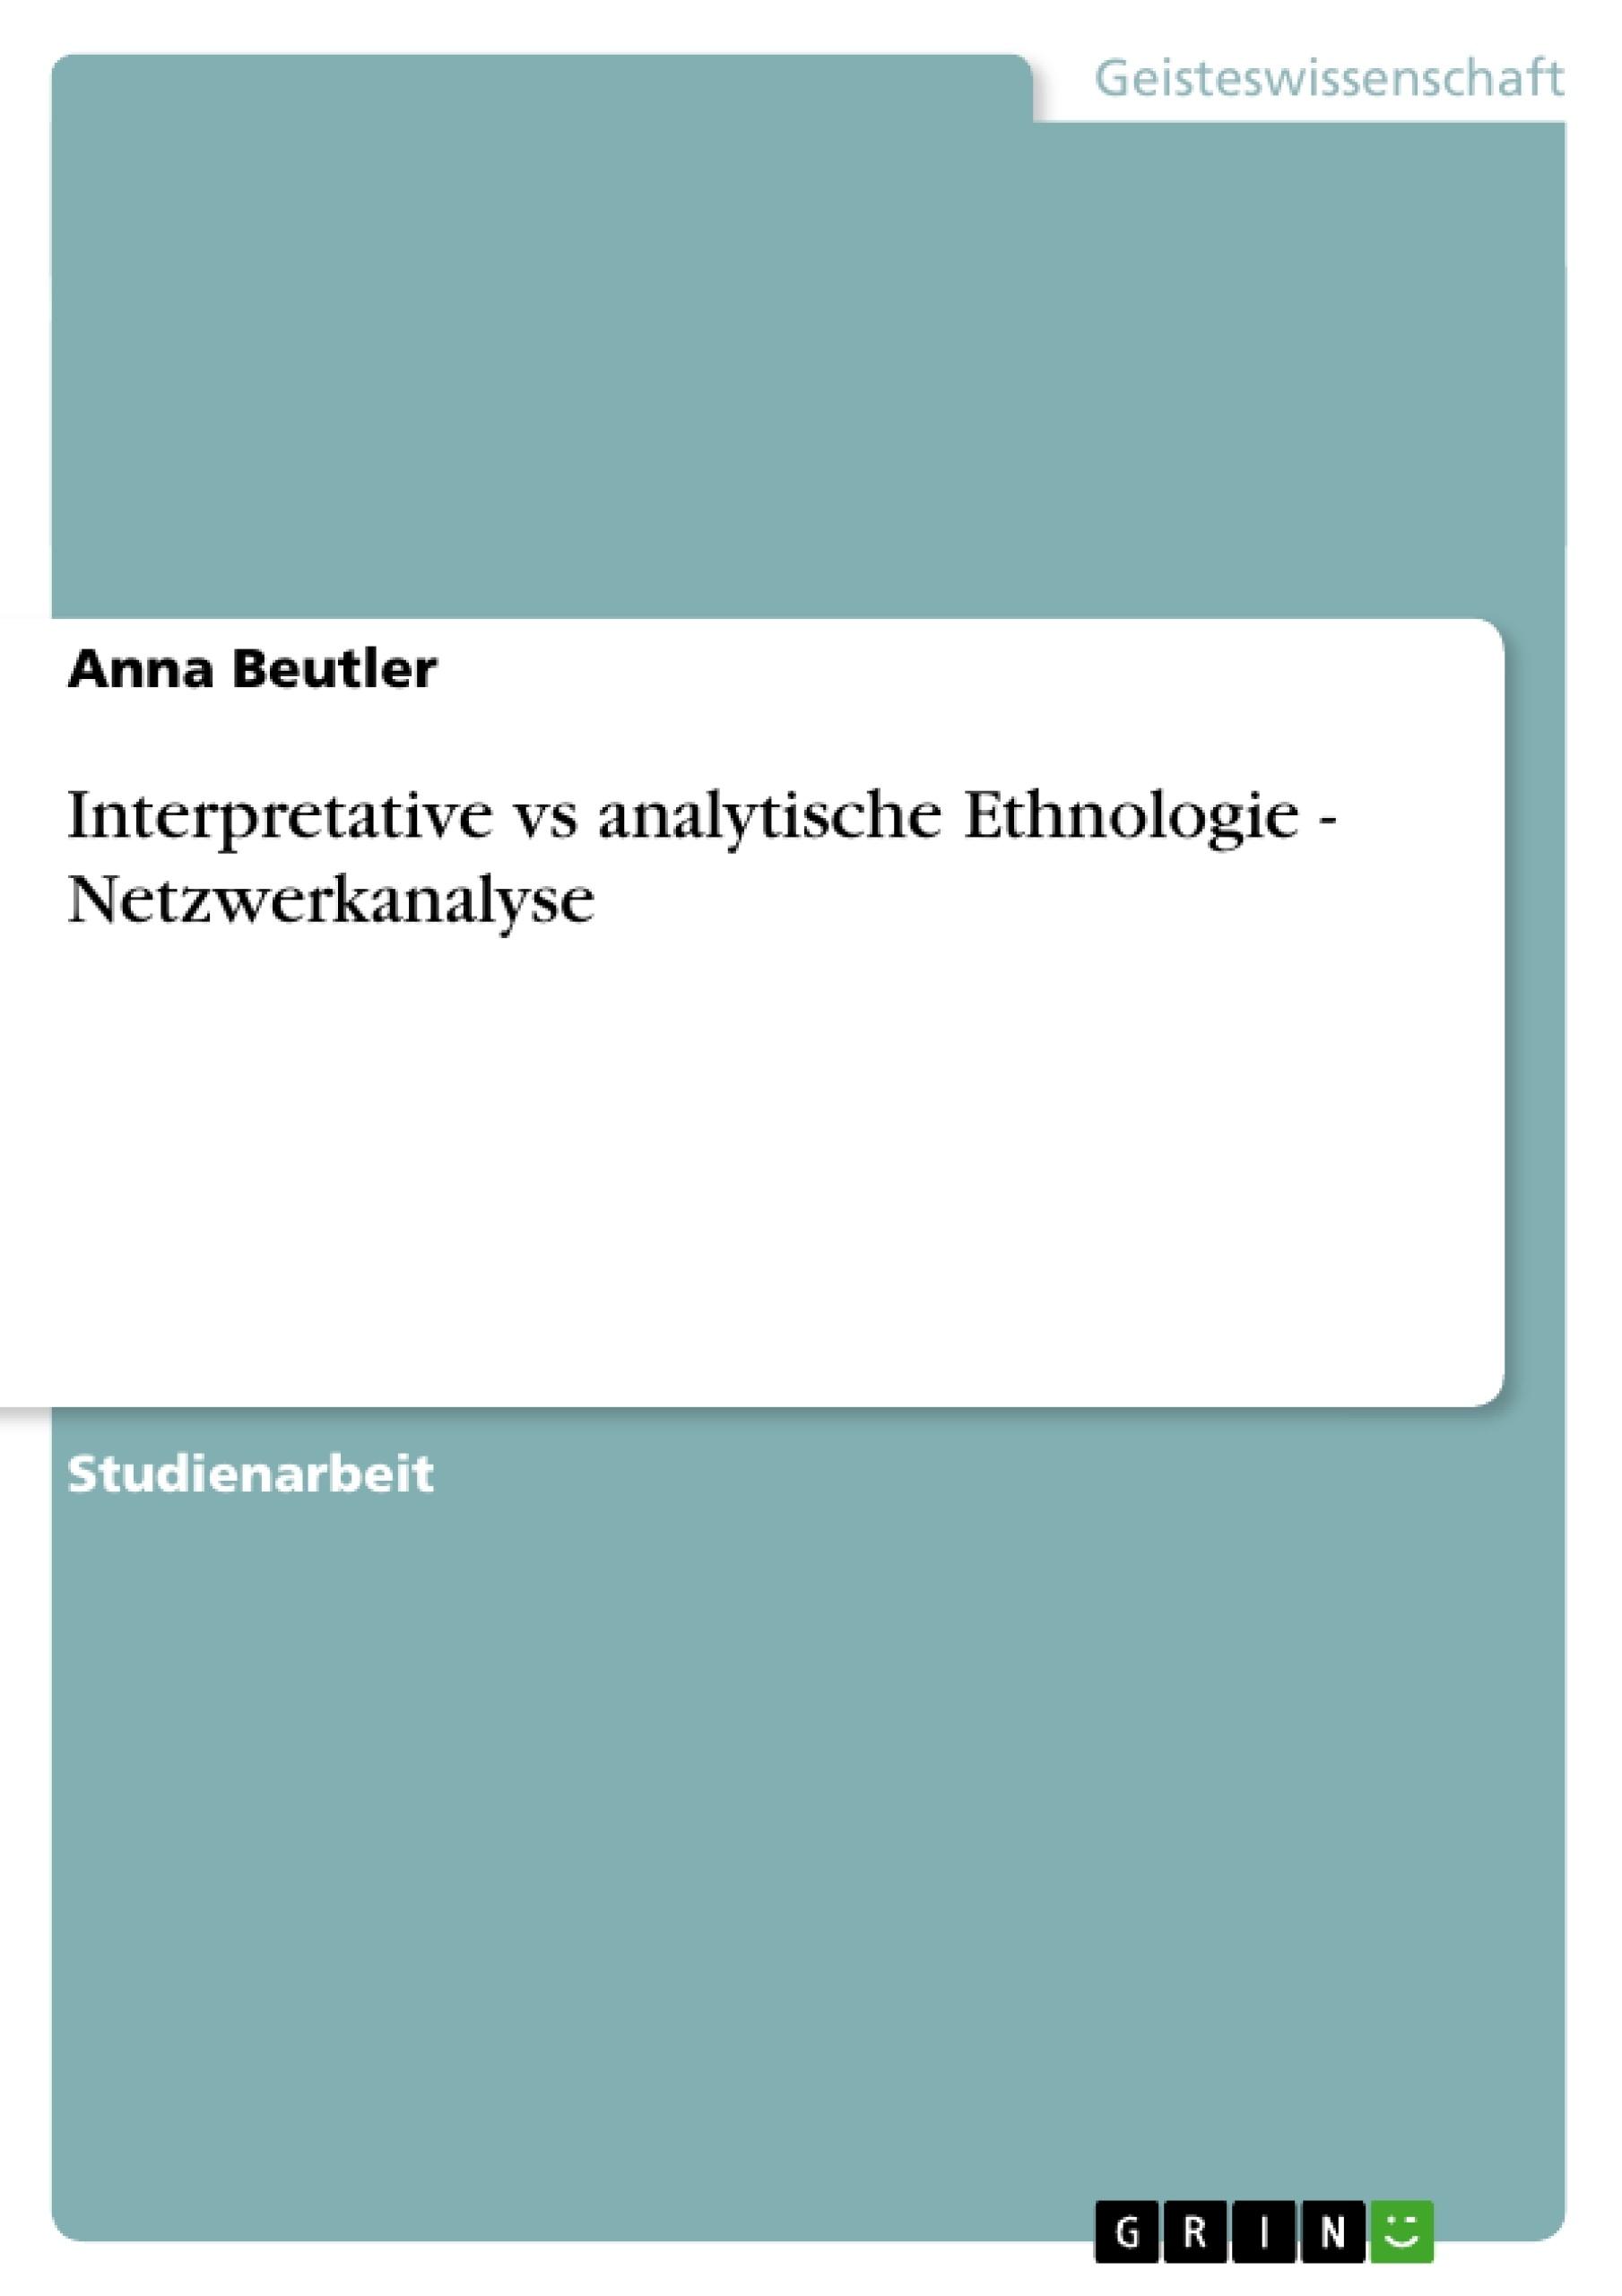 Titel: Interpretative vs analytische Ethnologie - Netzwerkanalyse